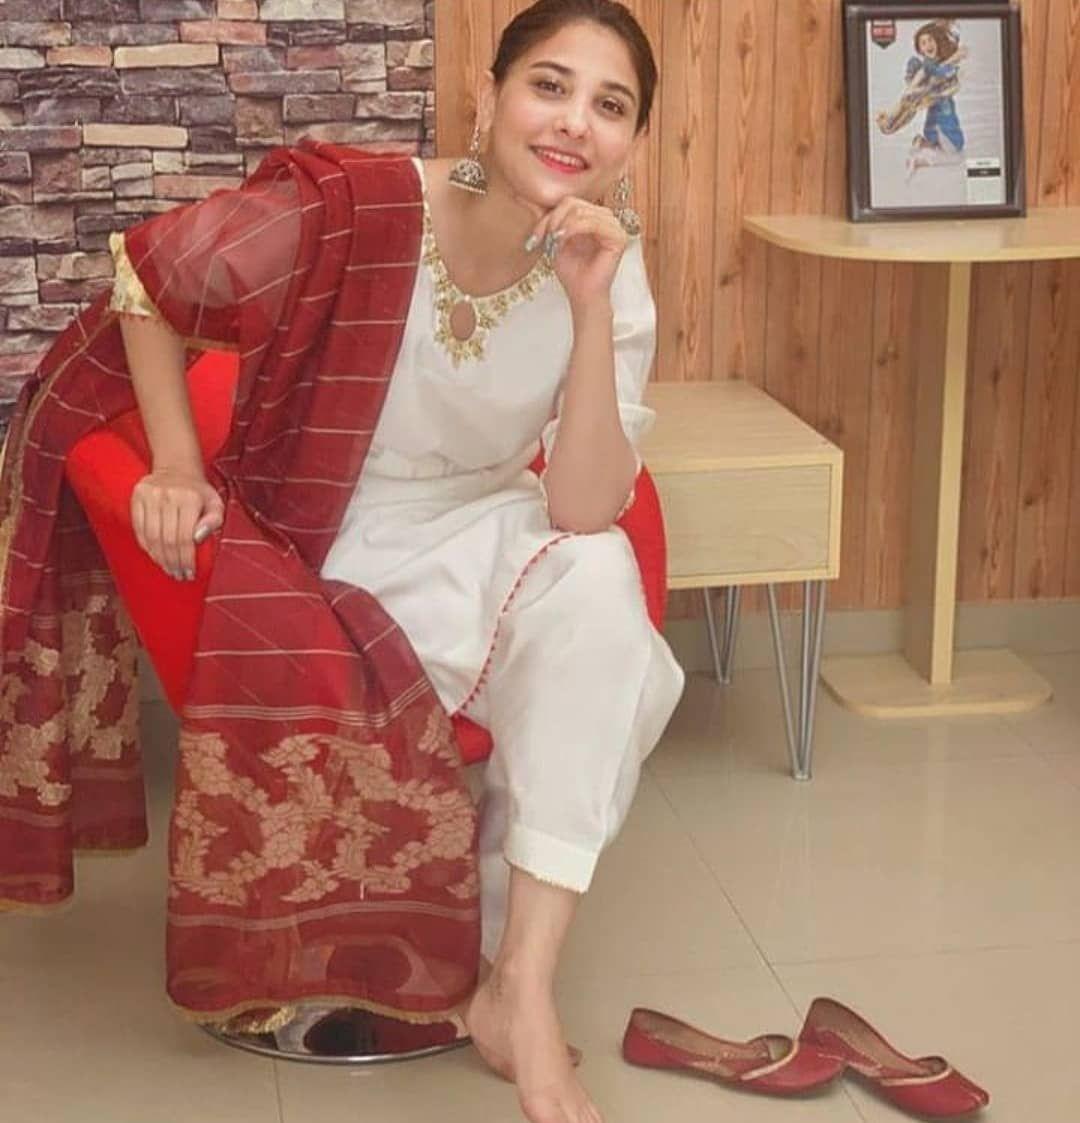 Hairstyle Girl Jora: Pin By Prabh On Fashion In 2020